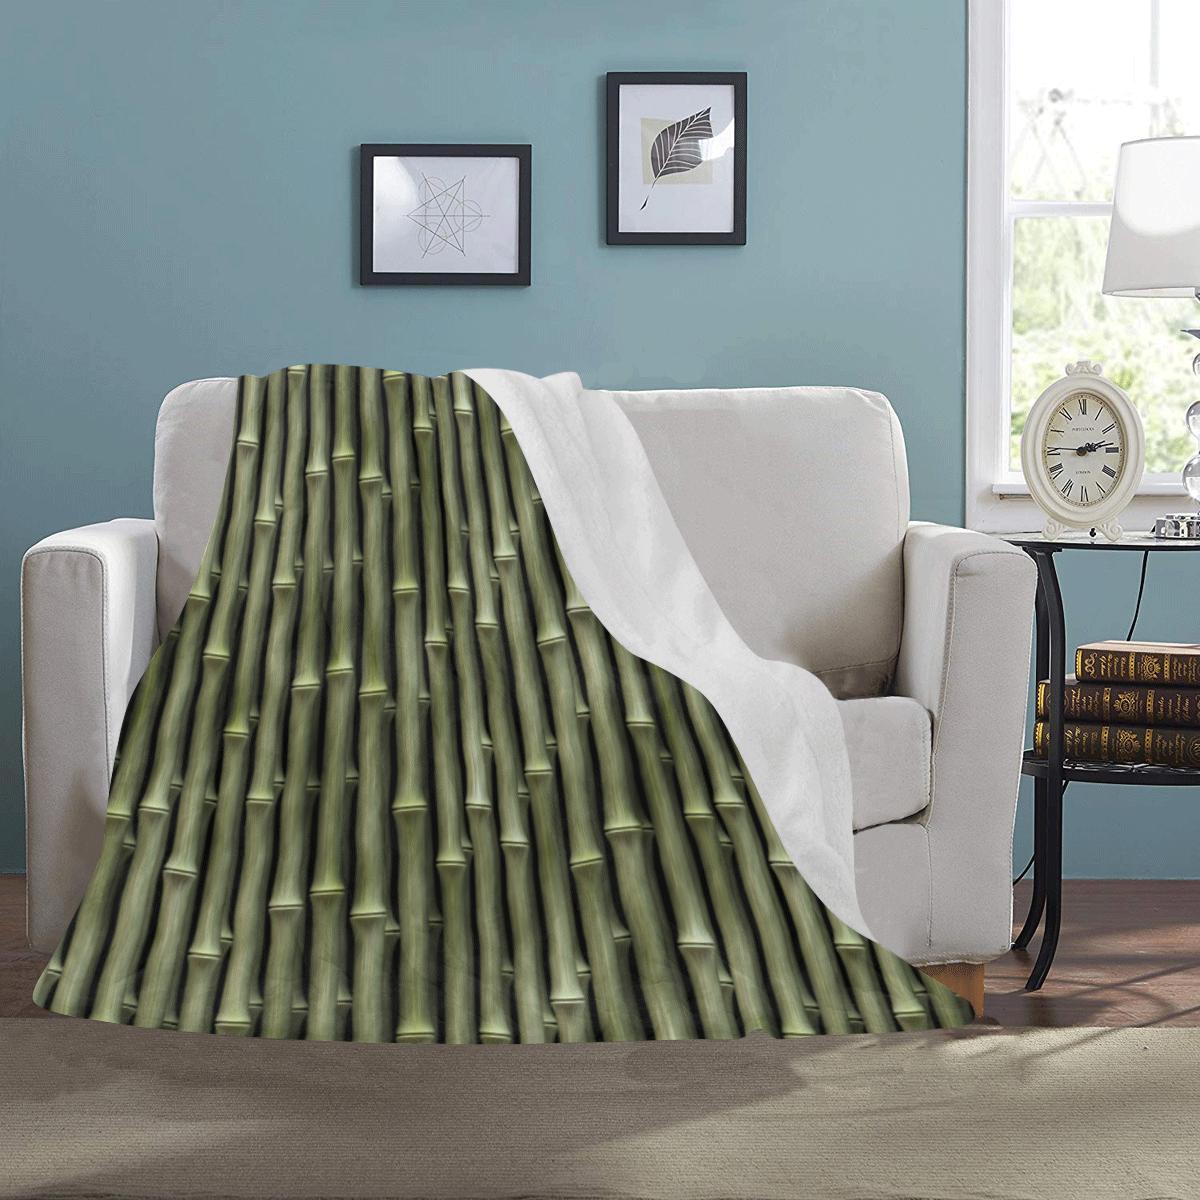 Bamboo forest Ultra-Soft Micro Fleece Blanket 43''x56''